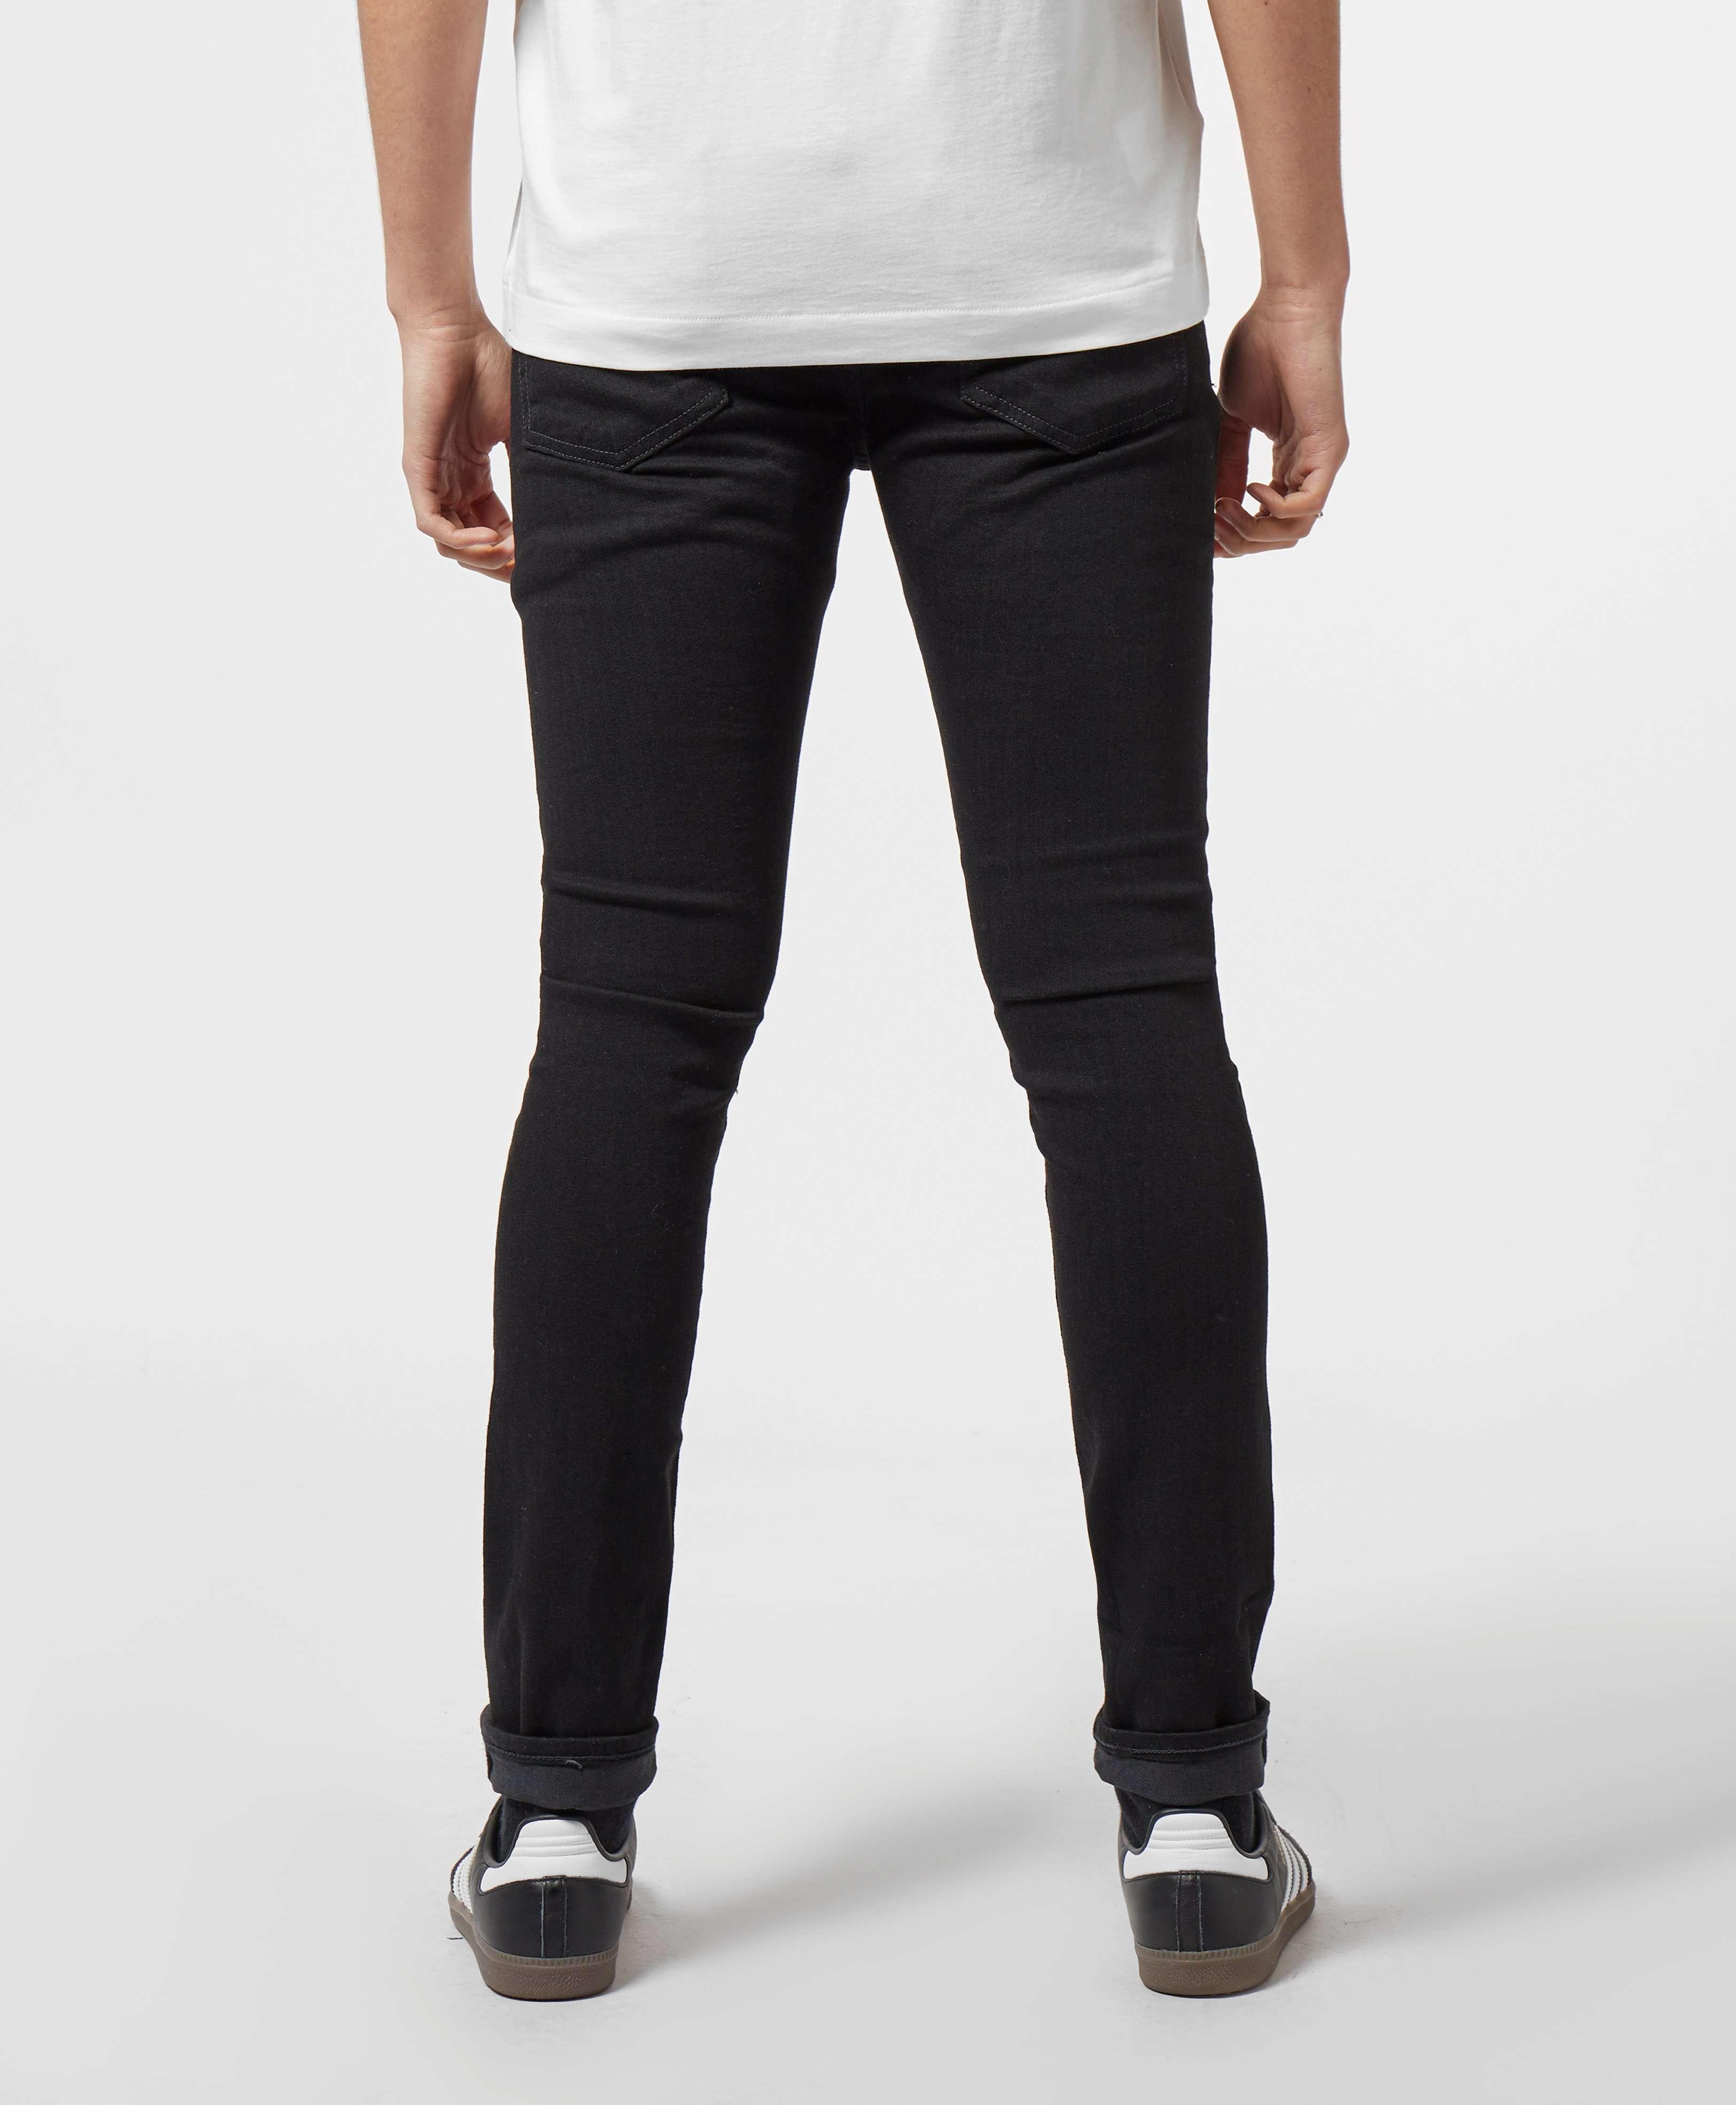 Levis 519 Stretch Extreme Skinny Jeans